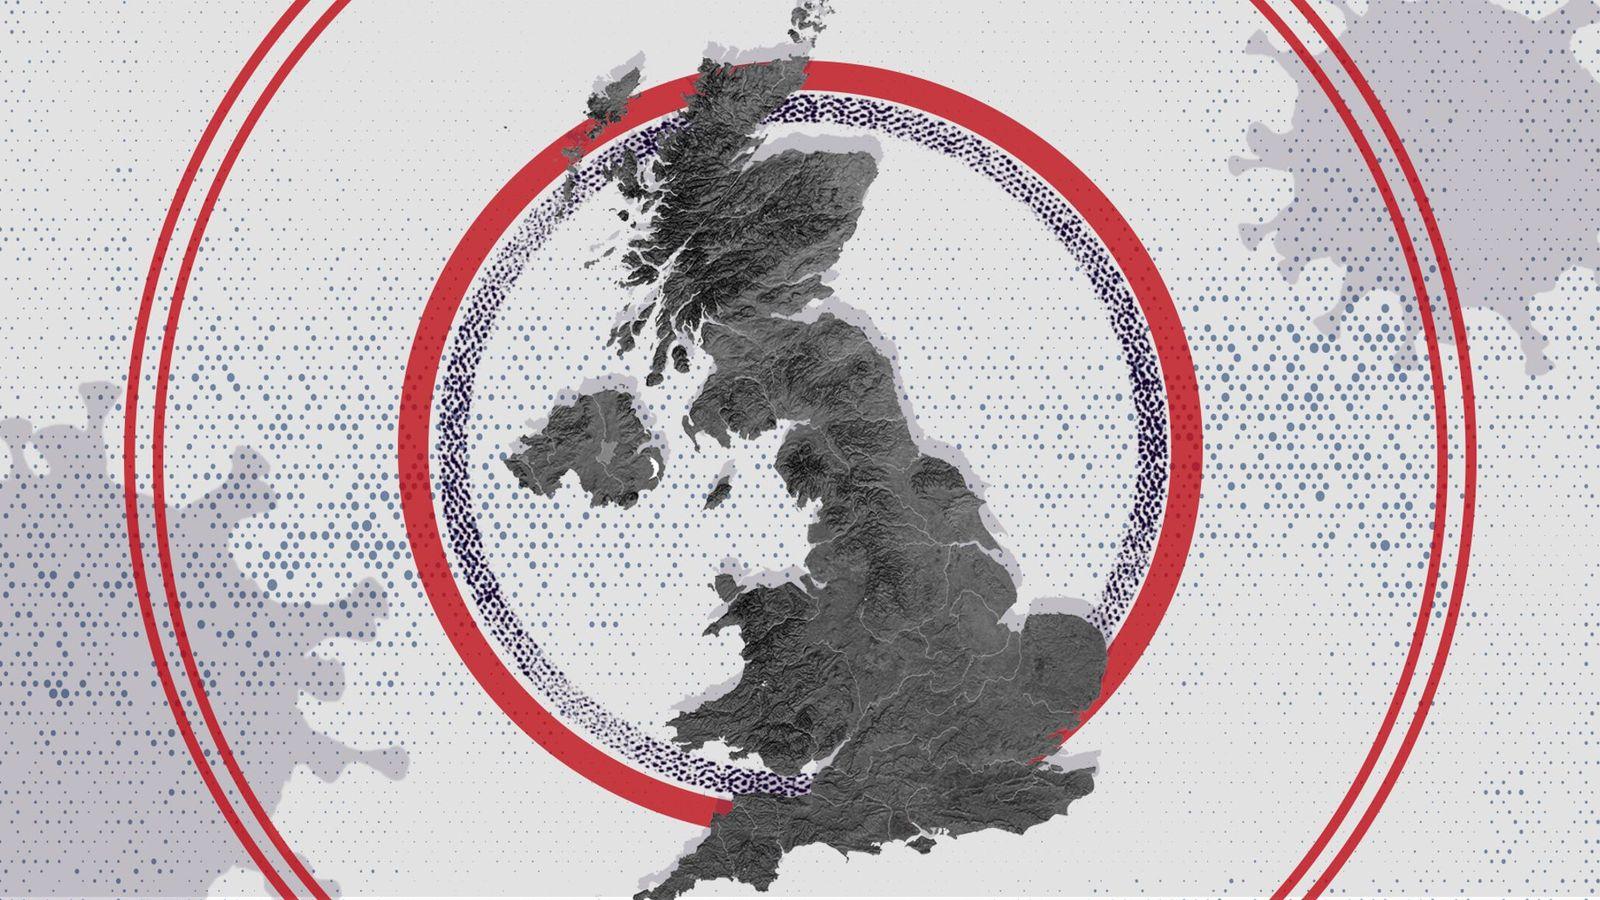 COVID-19: Where are the coronavirus hotspots in the UK?